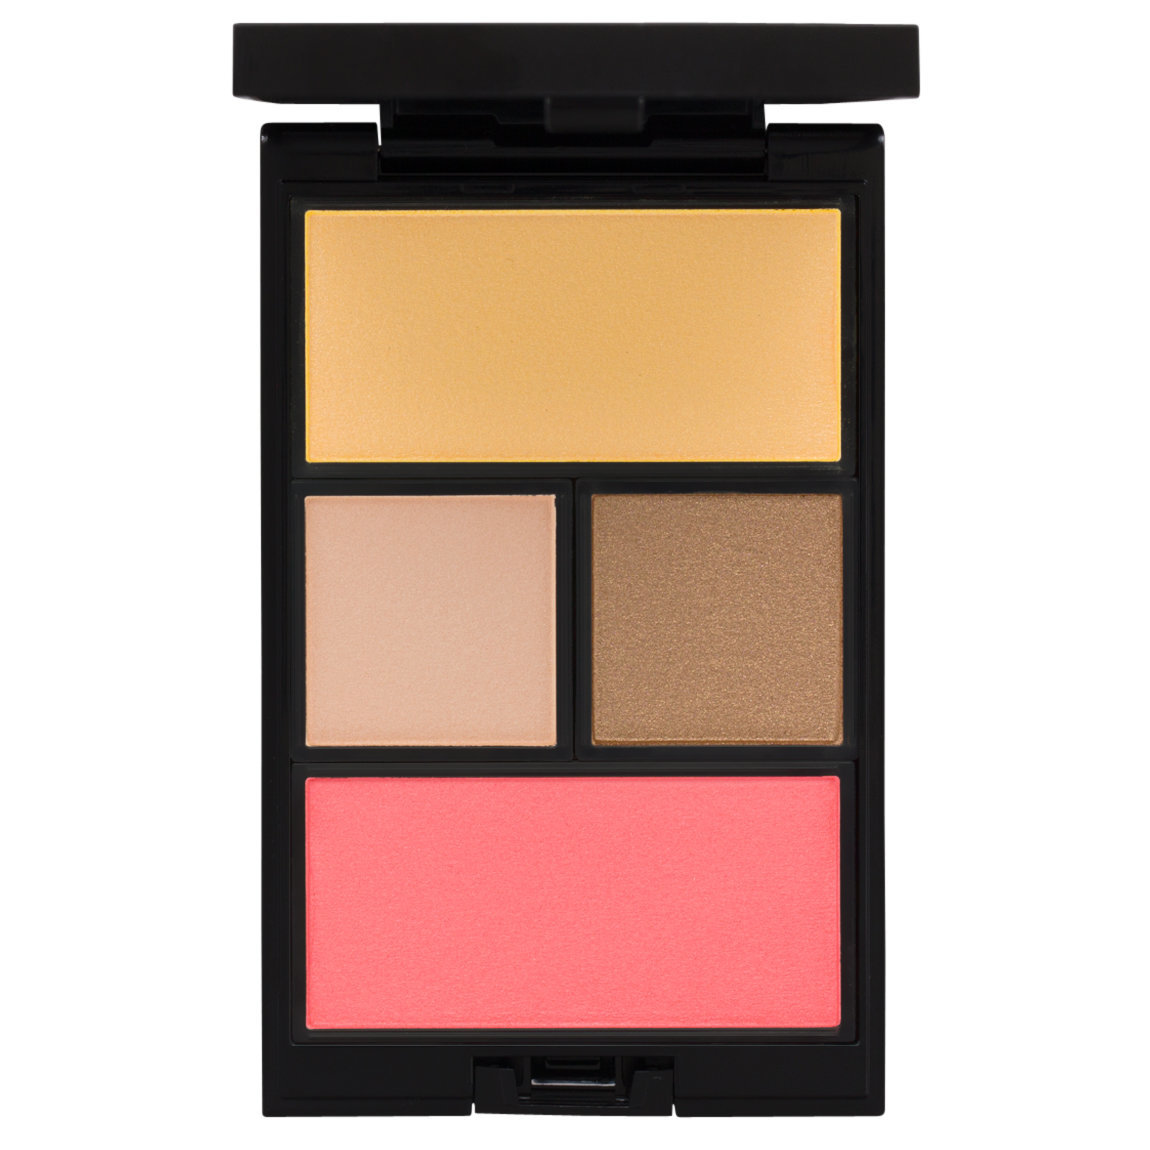 Surratt Beauty Heure d'Or Grande Palette product swatch.